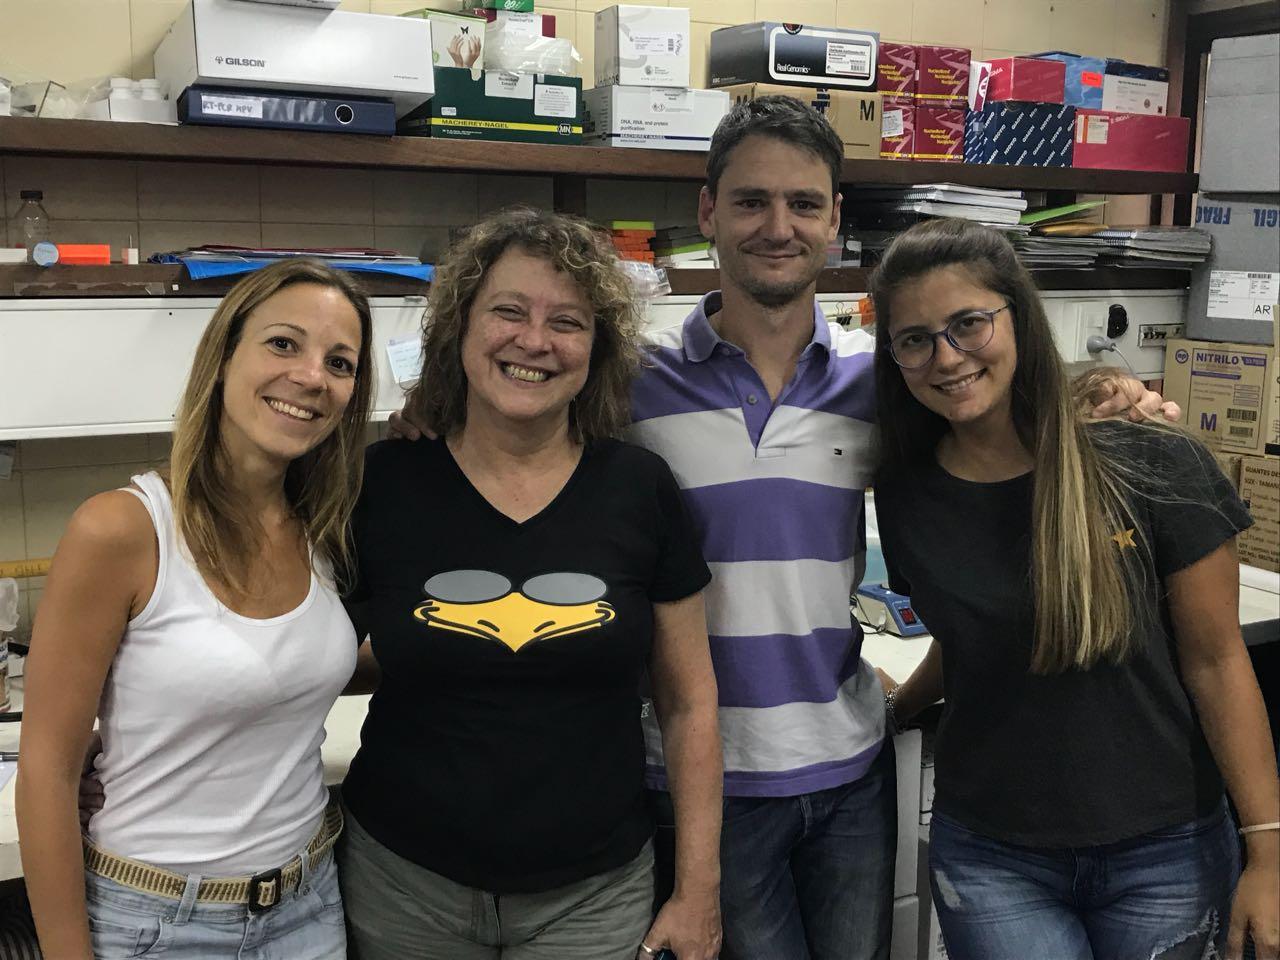 De izquierda a derecha, Dra. Florencia Re, Dra. Adriana Giri,Dr. Diego Chouhy, Dra. Elisa Bolatti.